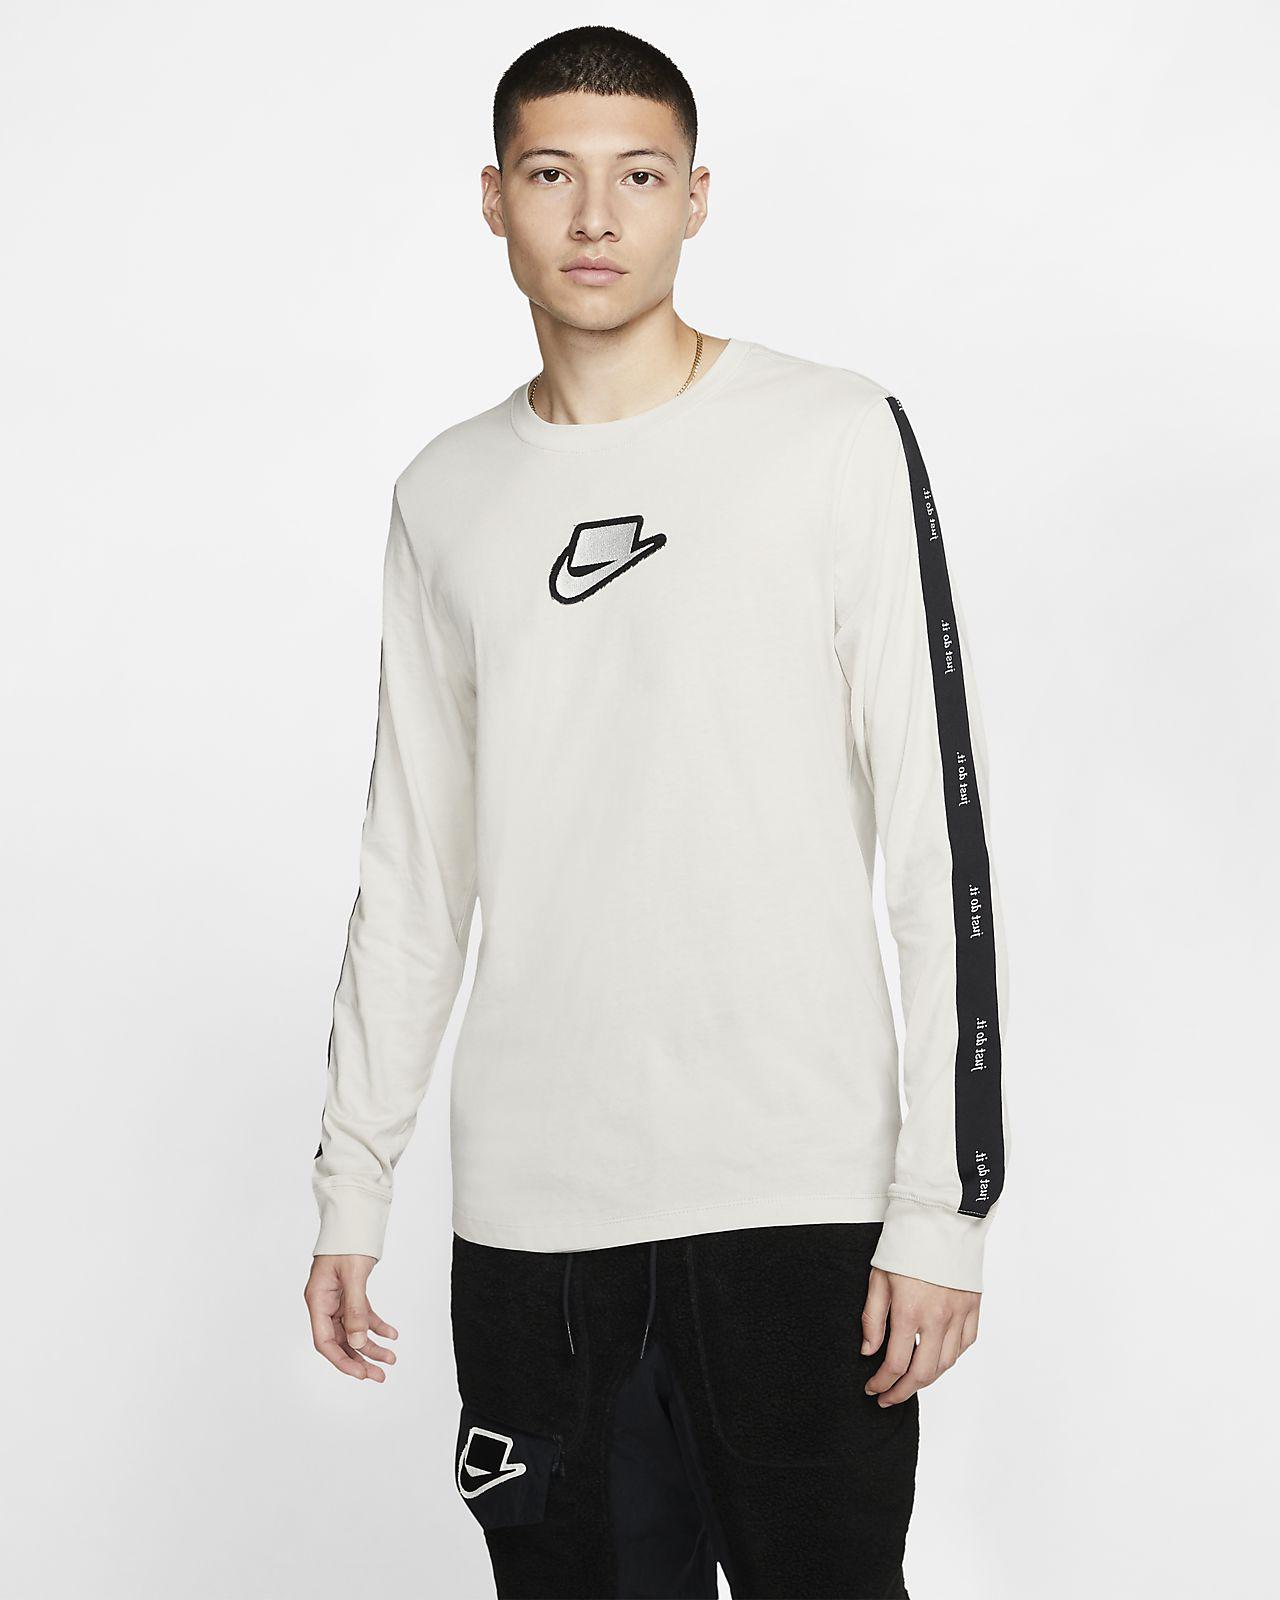 Camisola de manga comprida Nike Sportswear NSW para homem